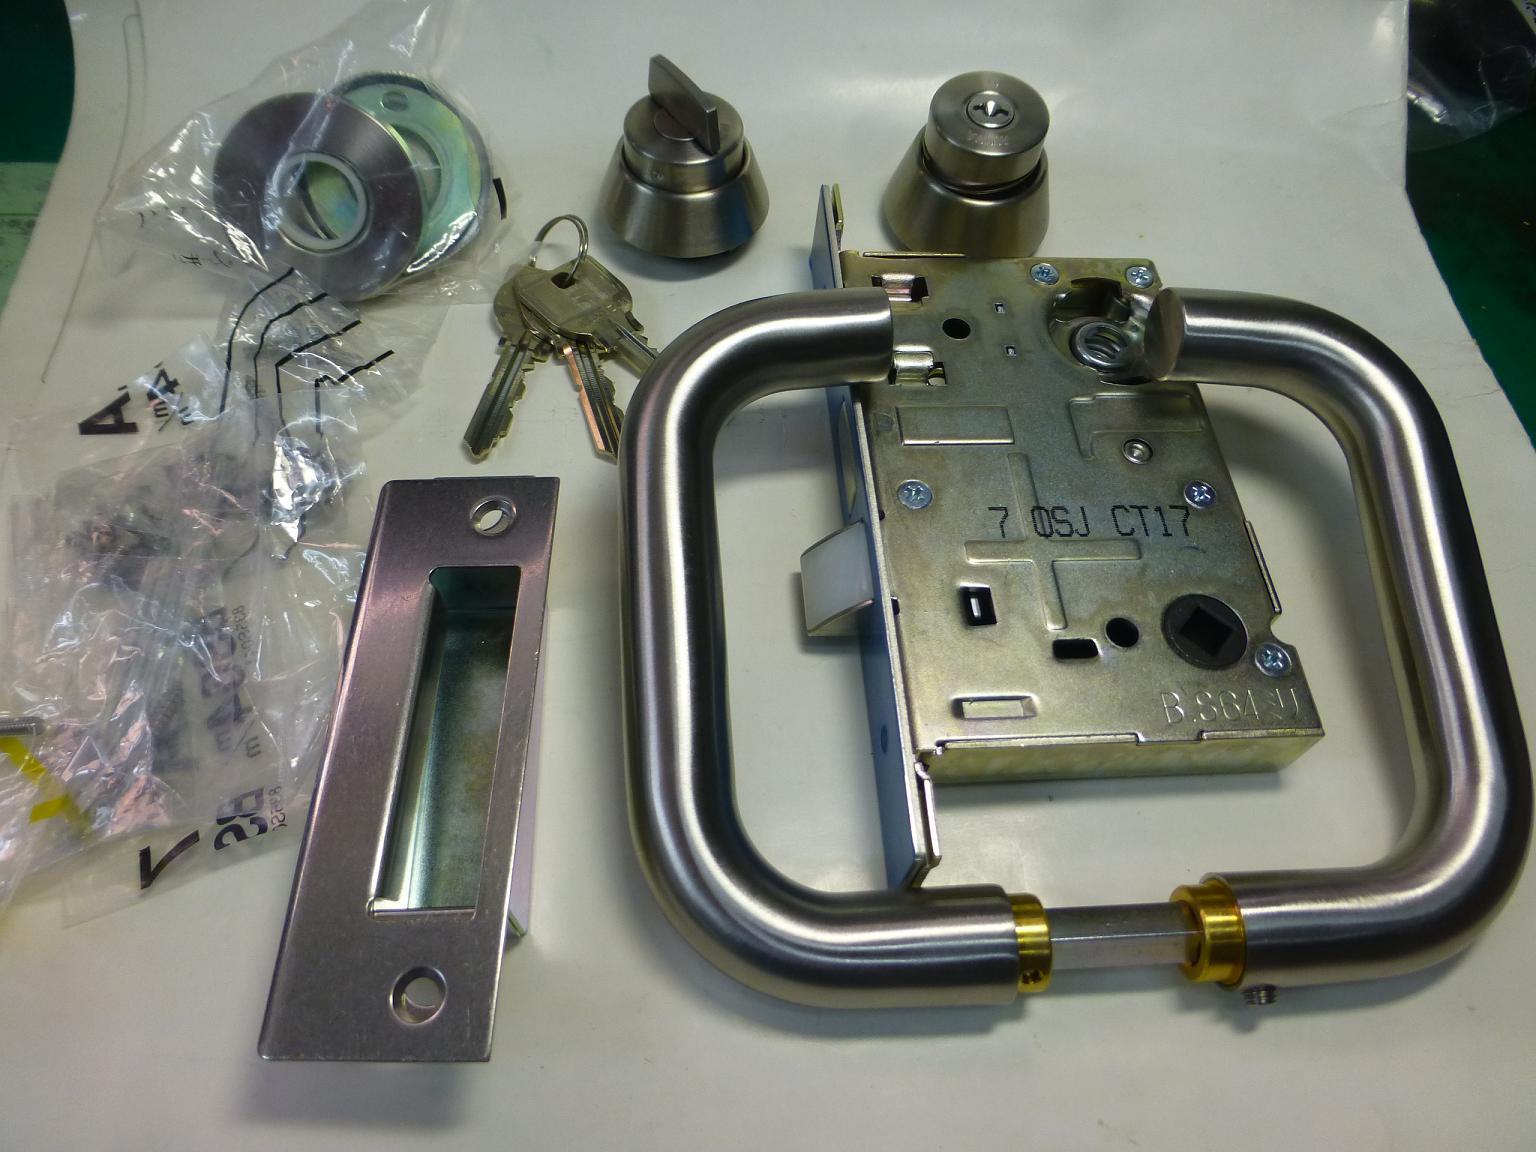 MIWA レバーハンドルセットU9LA64 B/S64mm 扉厚33~42mm